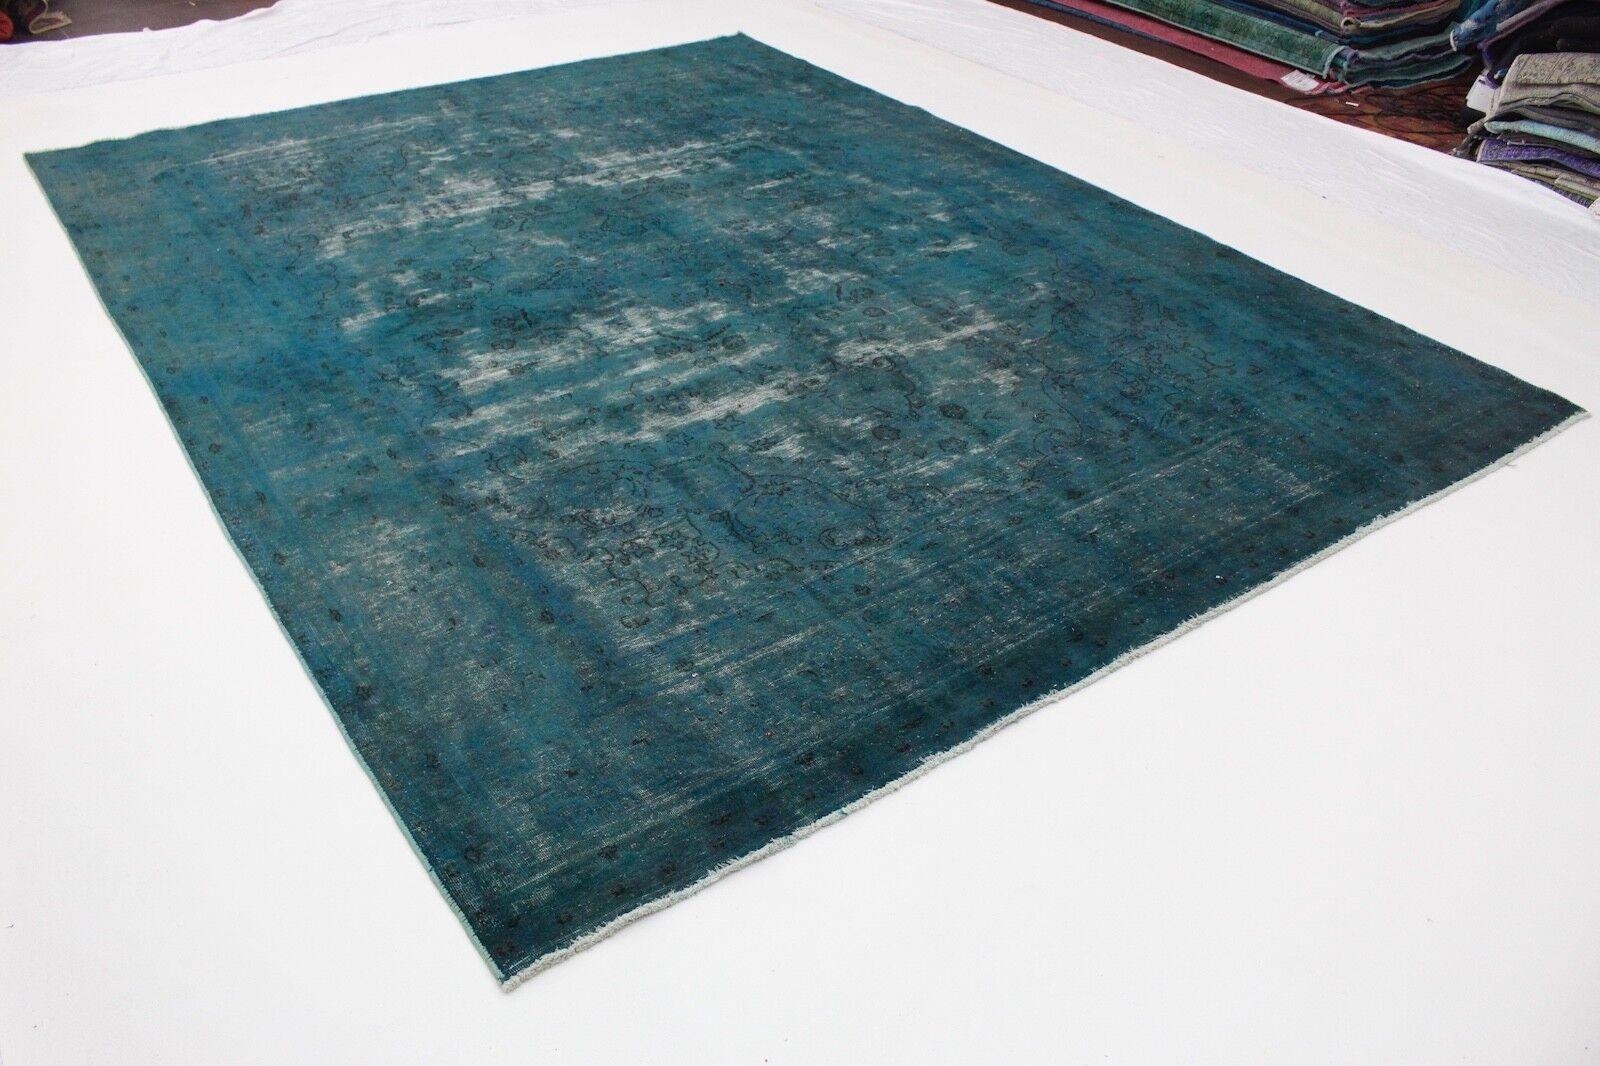 Tappeto Moderno Turchese : Tappeto blu turchese tappeto moderno georgia batumi blu stile